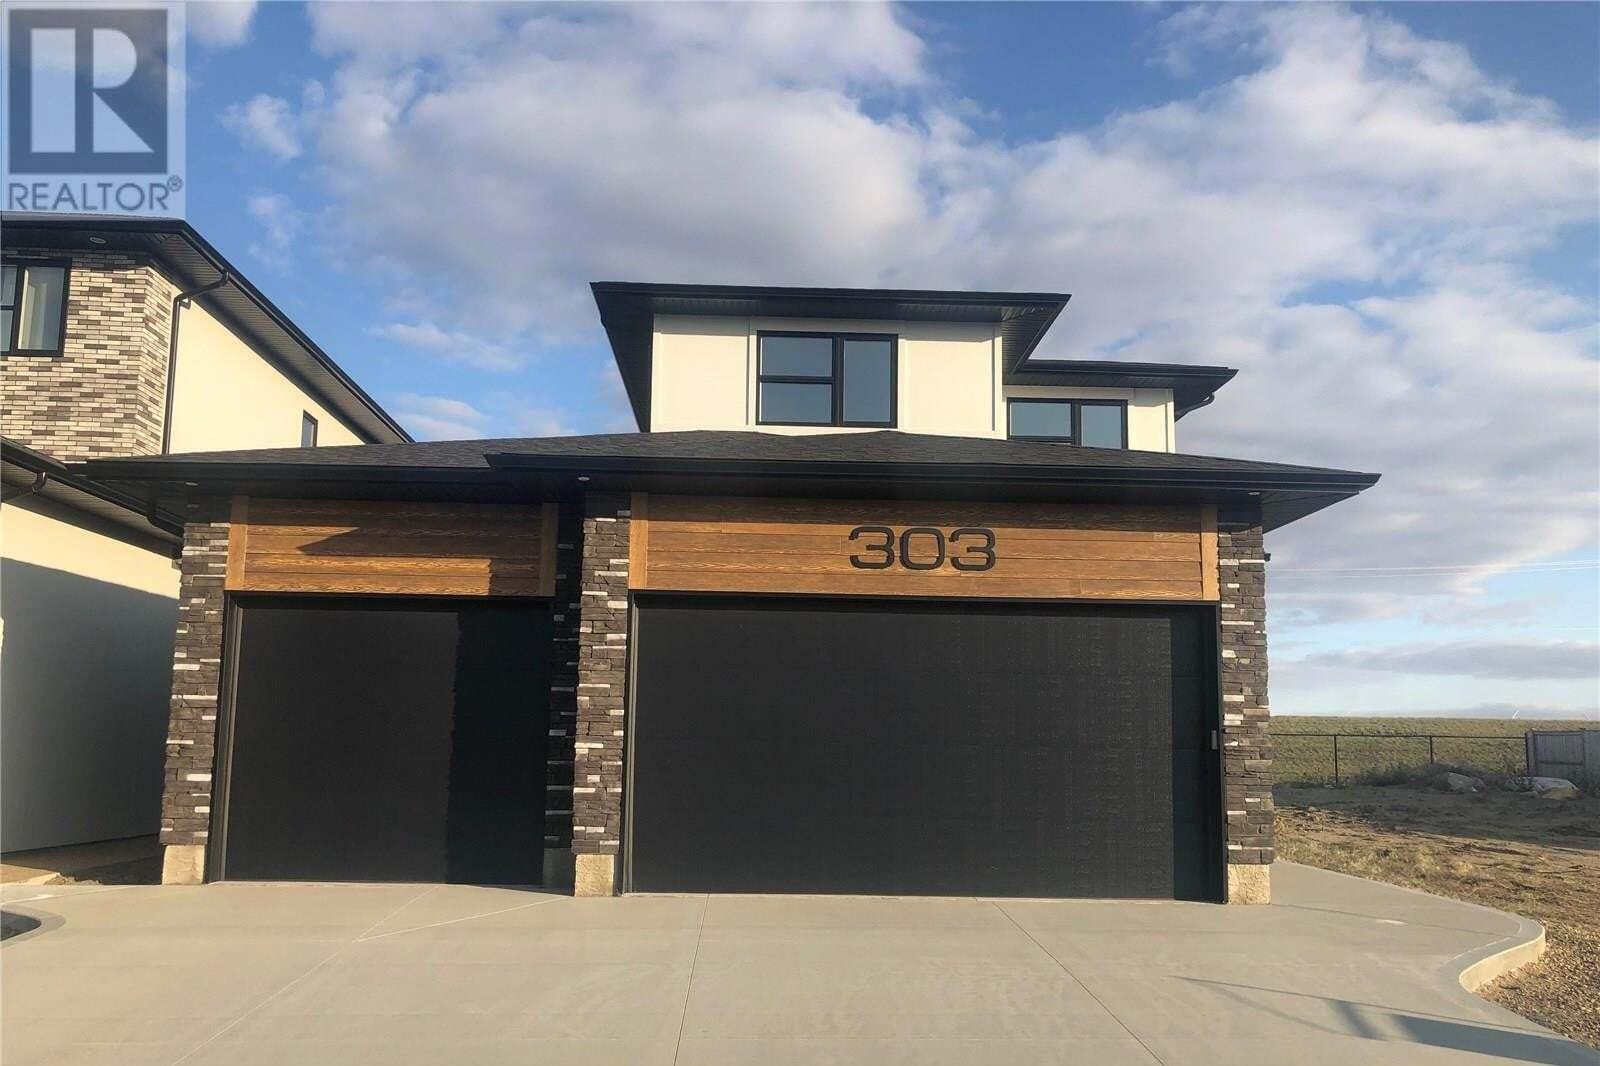 House for sale at 303 Arscott Cres Saskatoon Saskatchewan - MLS: SK810177